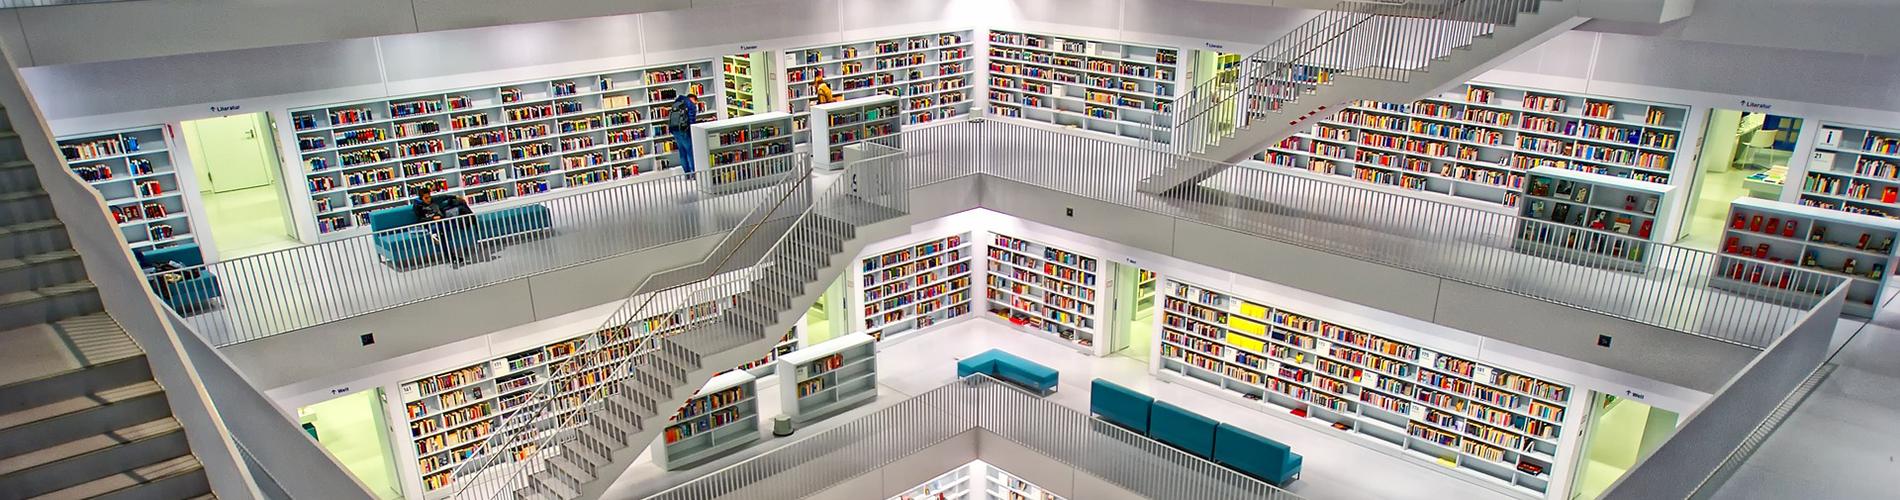 Knowledge center landauer